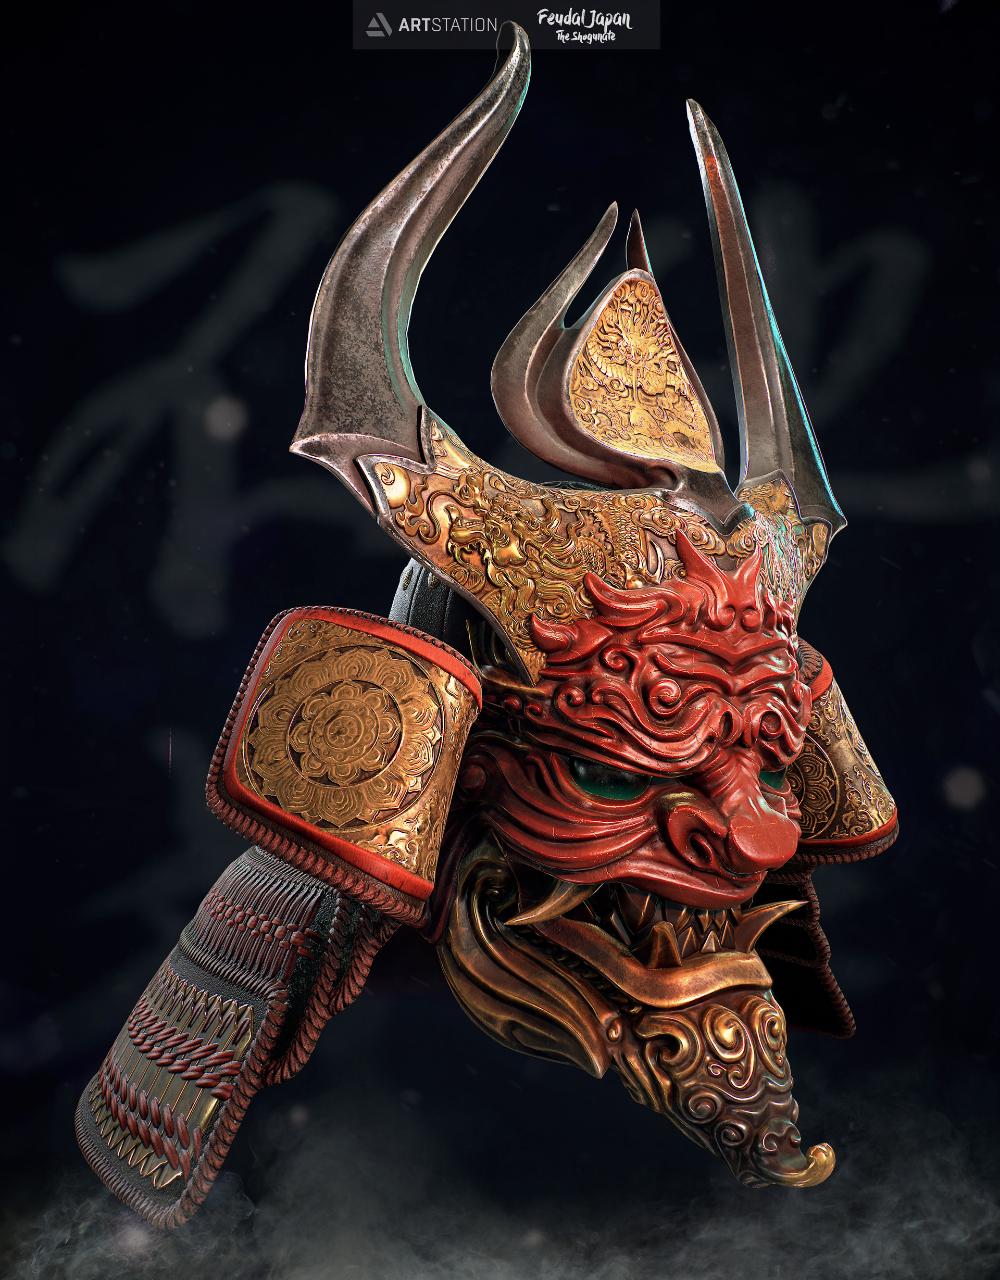 Artstation Oni Samurai Helmet Doru Bogdan Bronya Samuraya Kartinki Cherepa Samurajskoe Iskusstvo